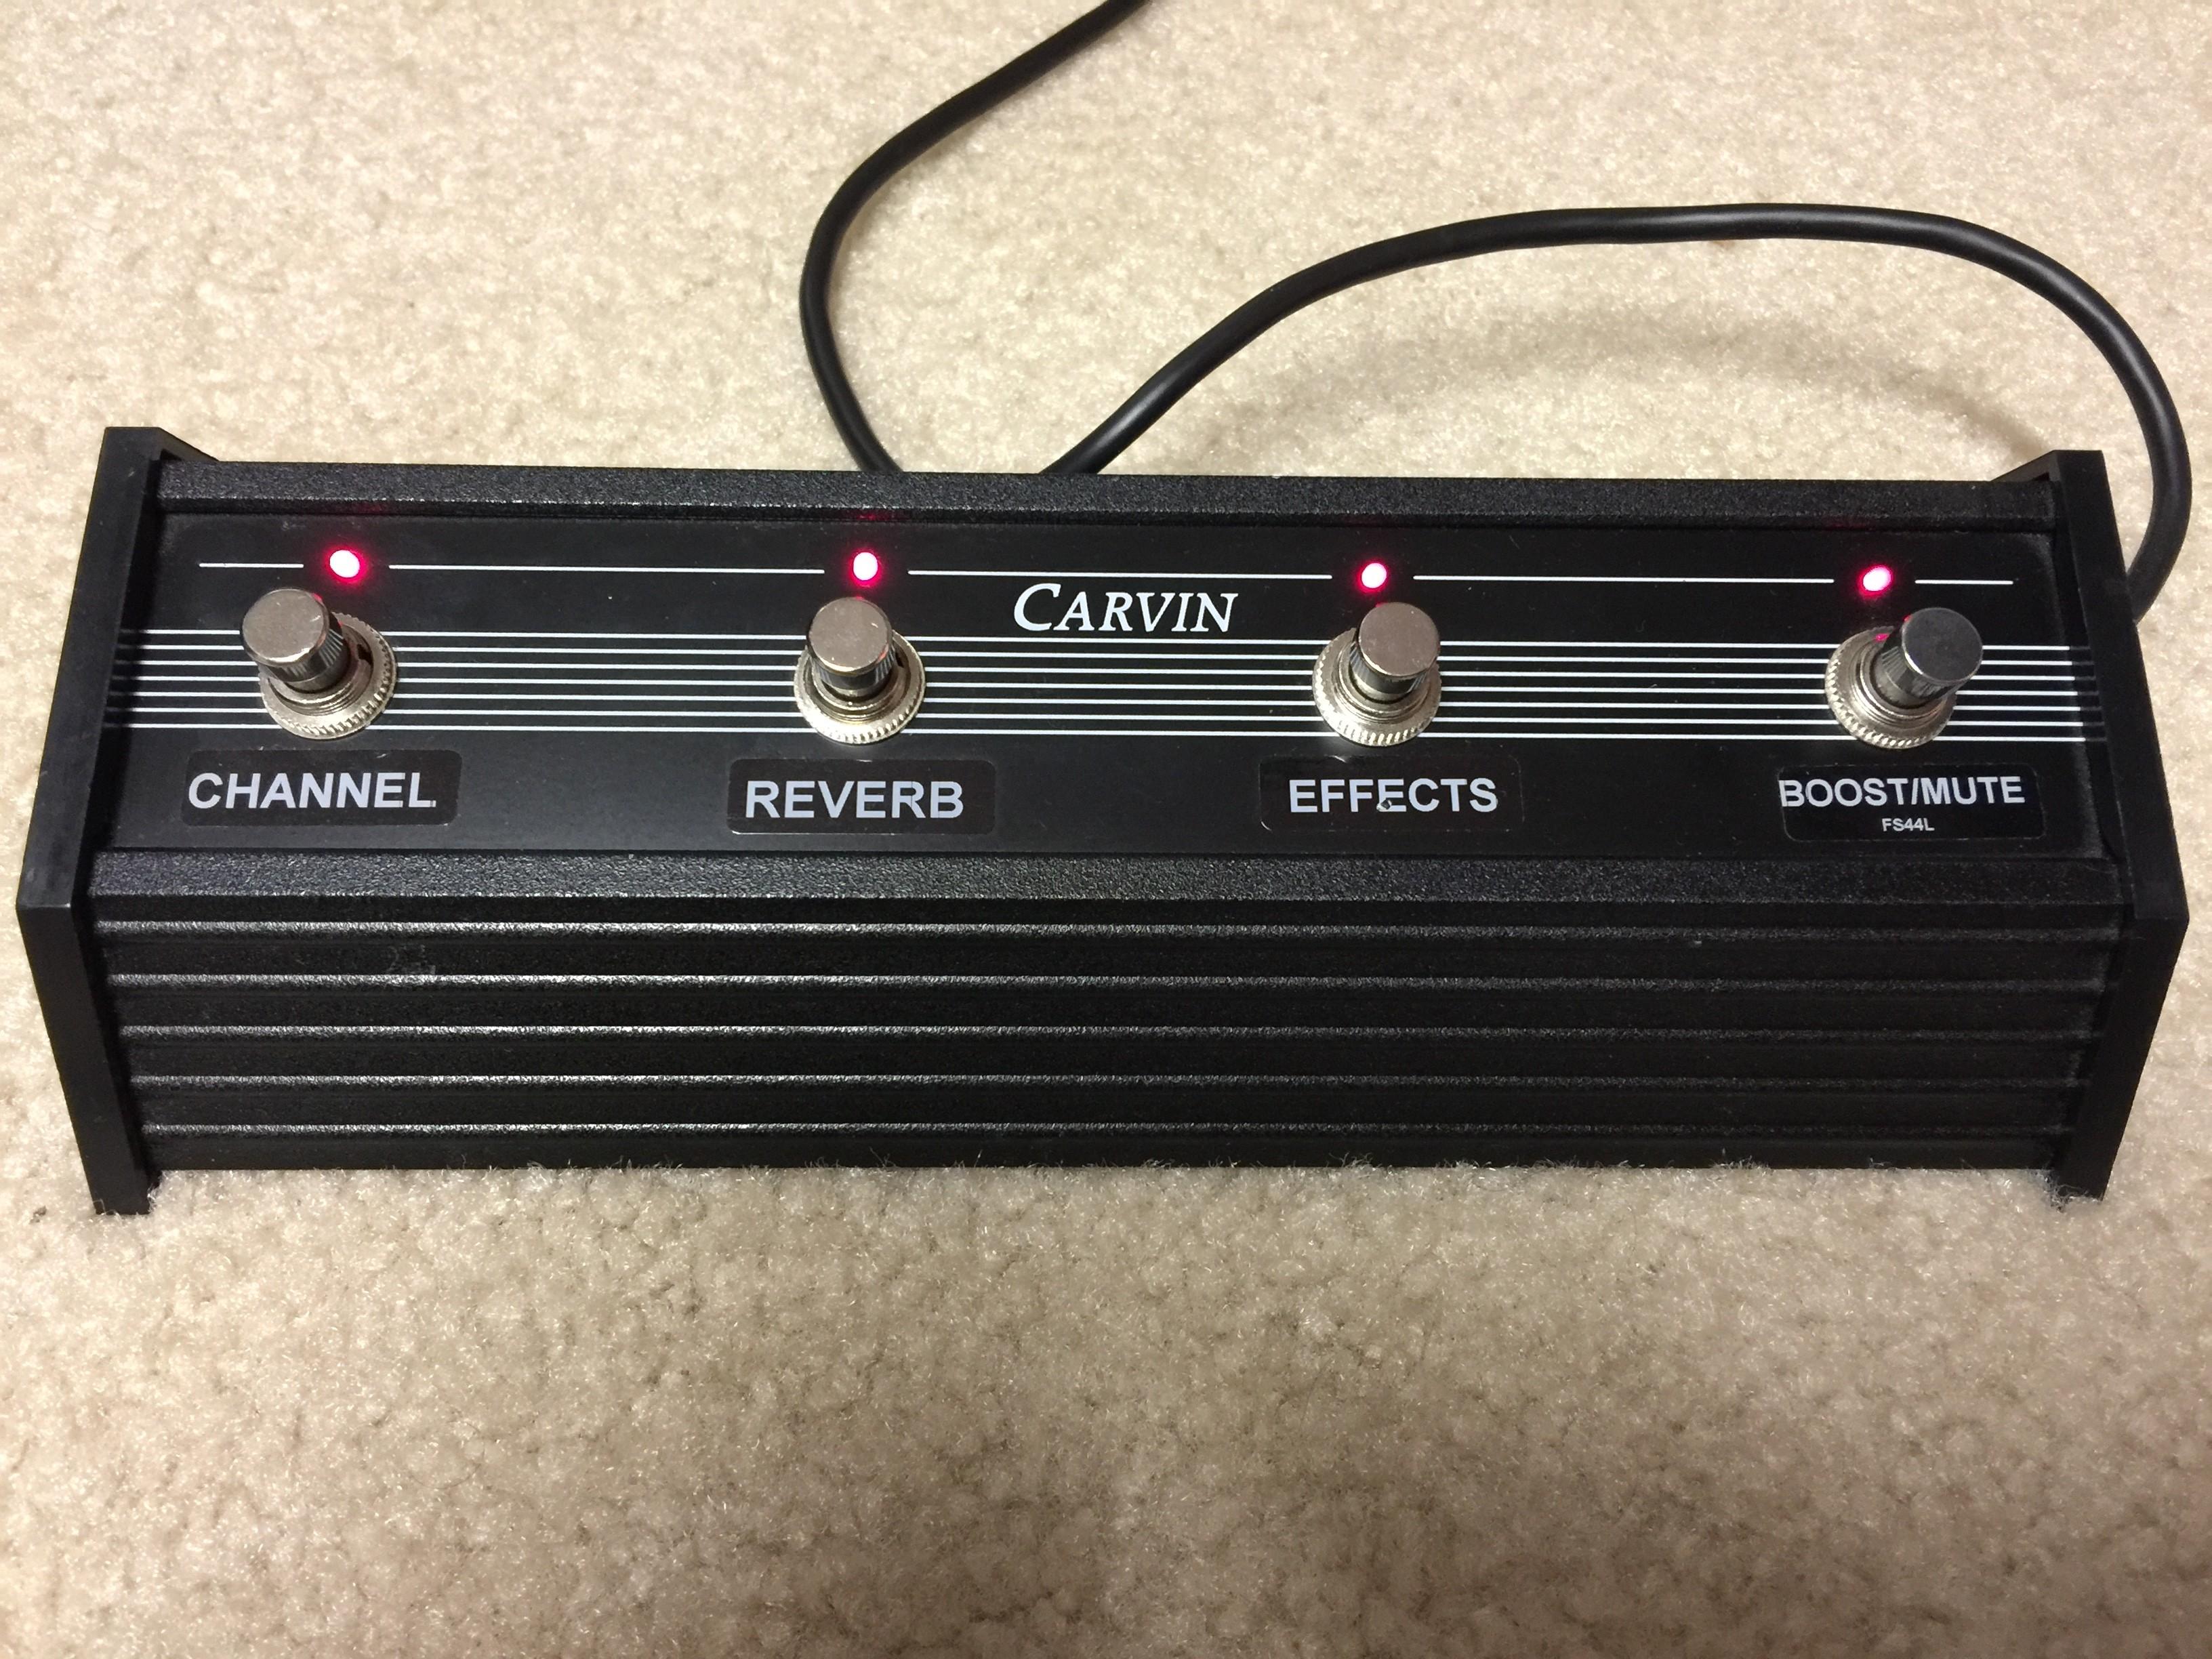 Carvin X 100 B Watt Head Bass Wiring Diagrams Thanks For Looking